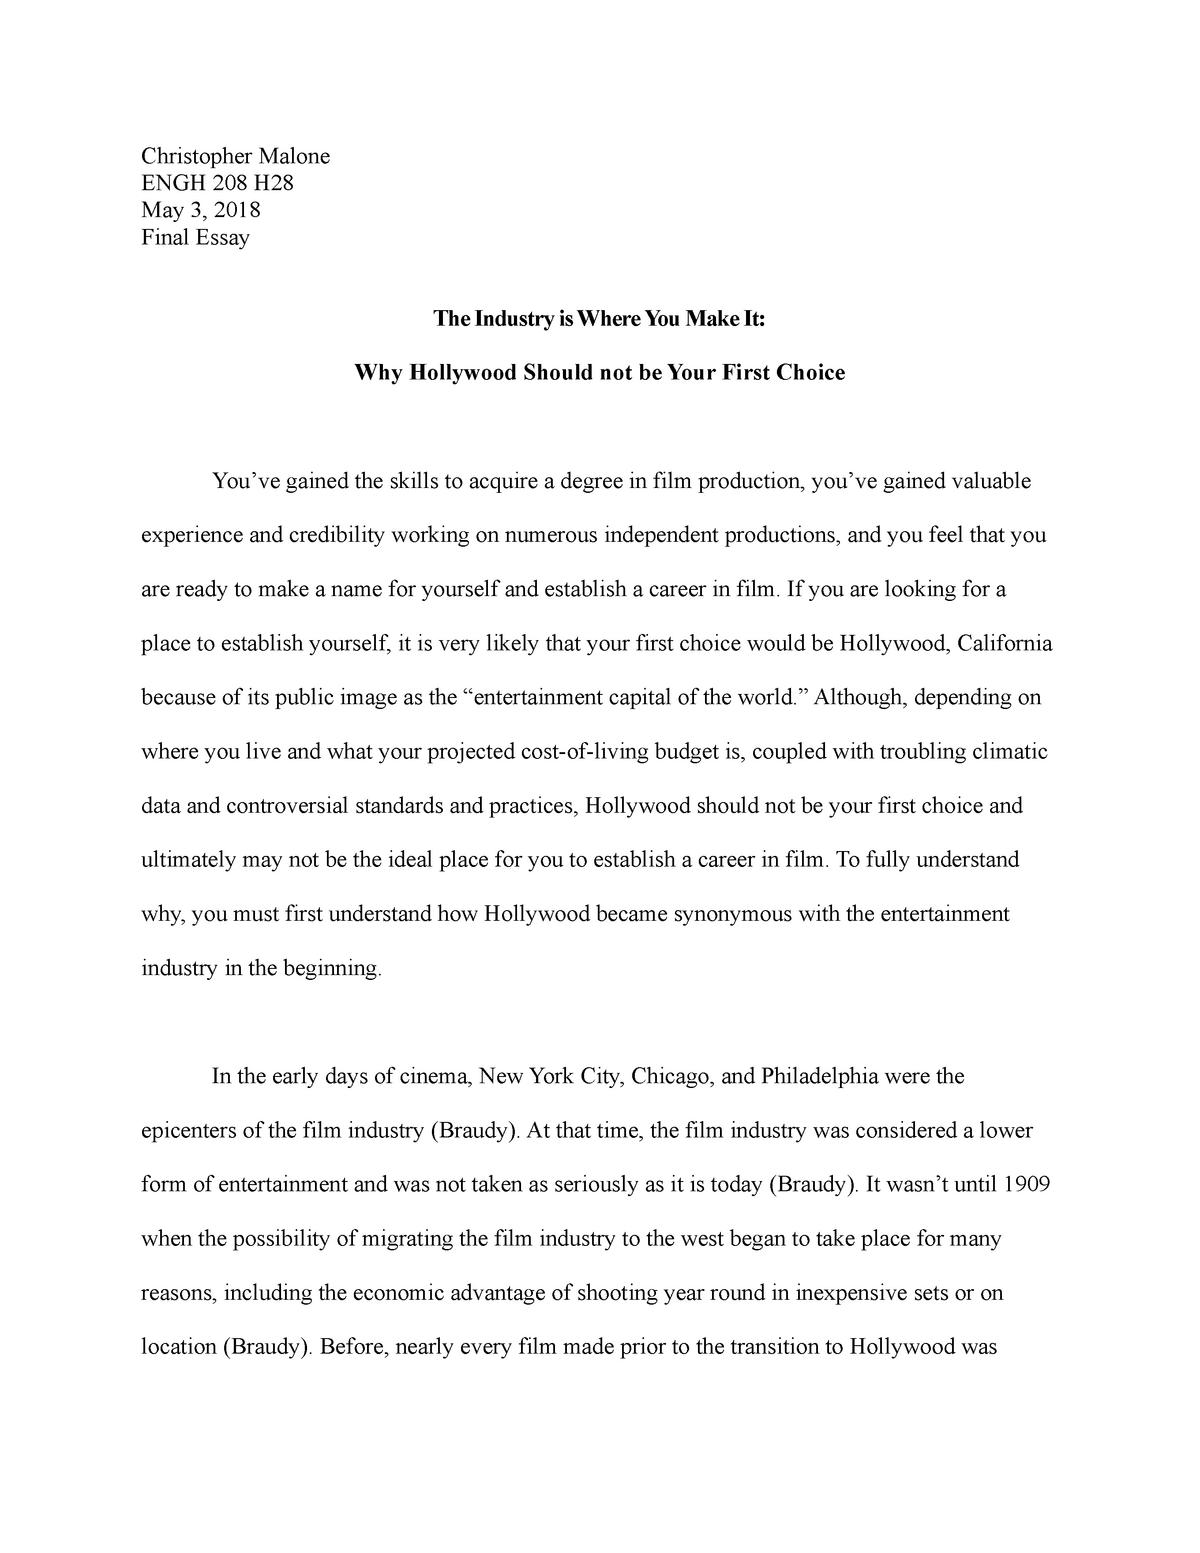 film history essay